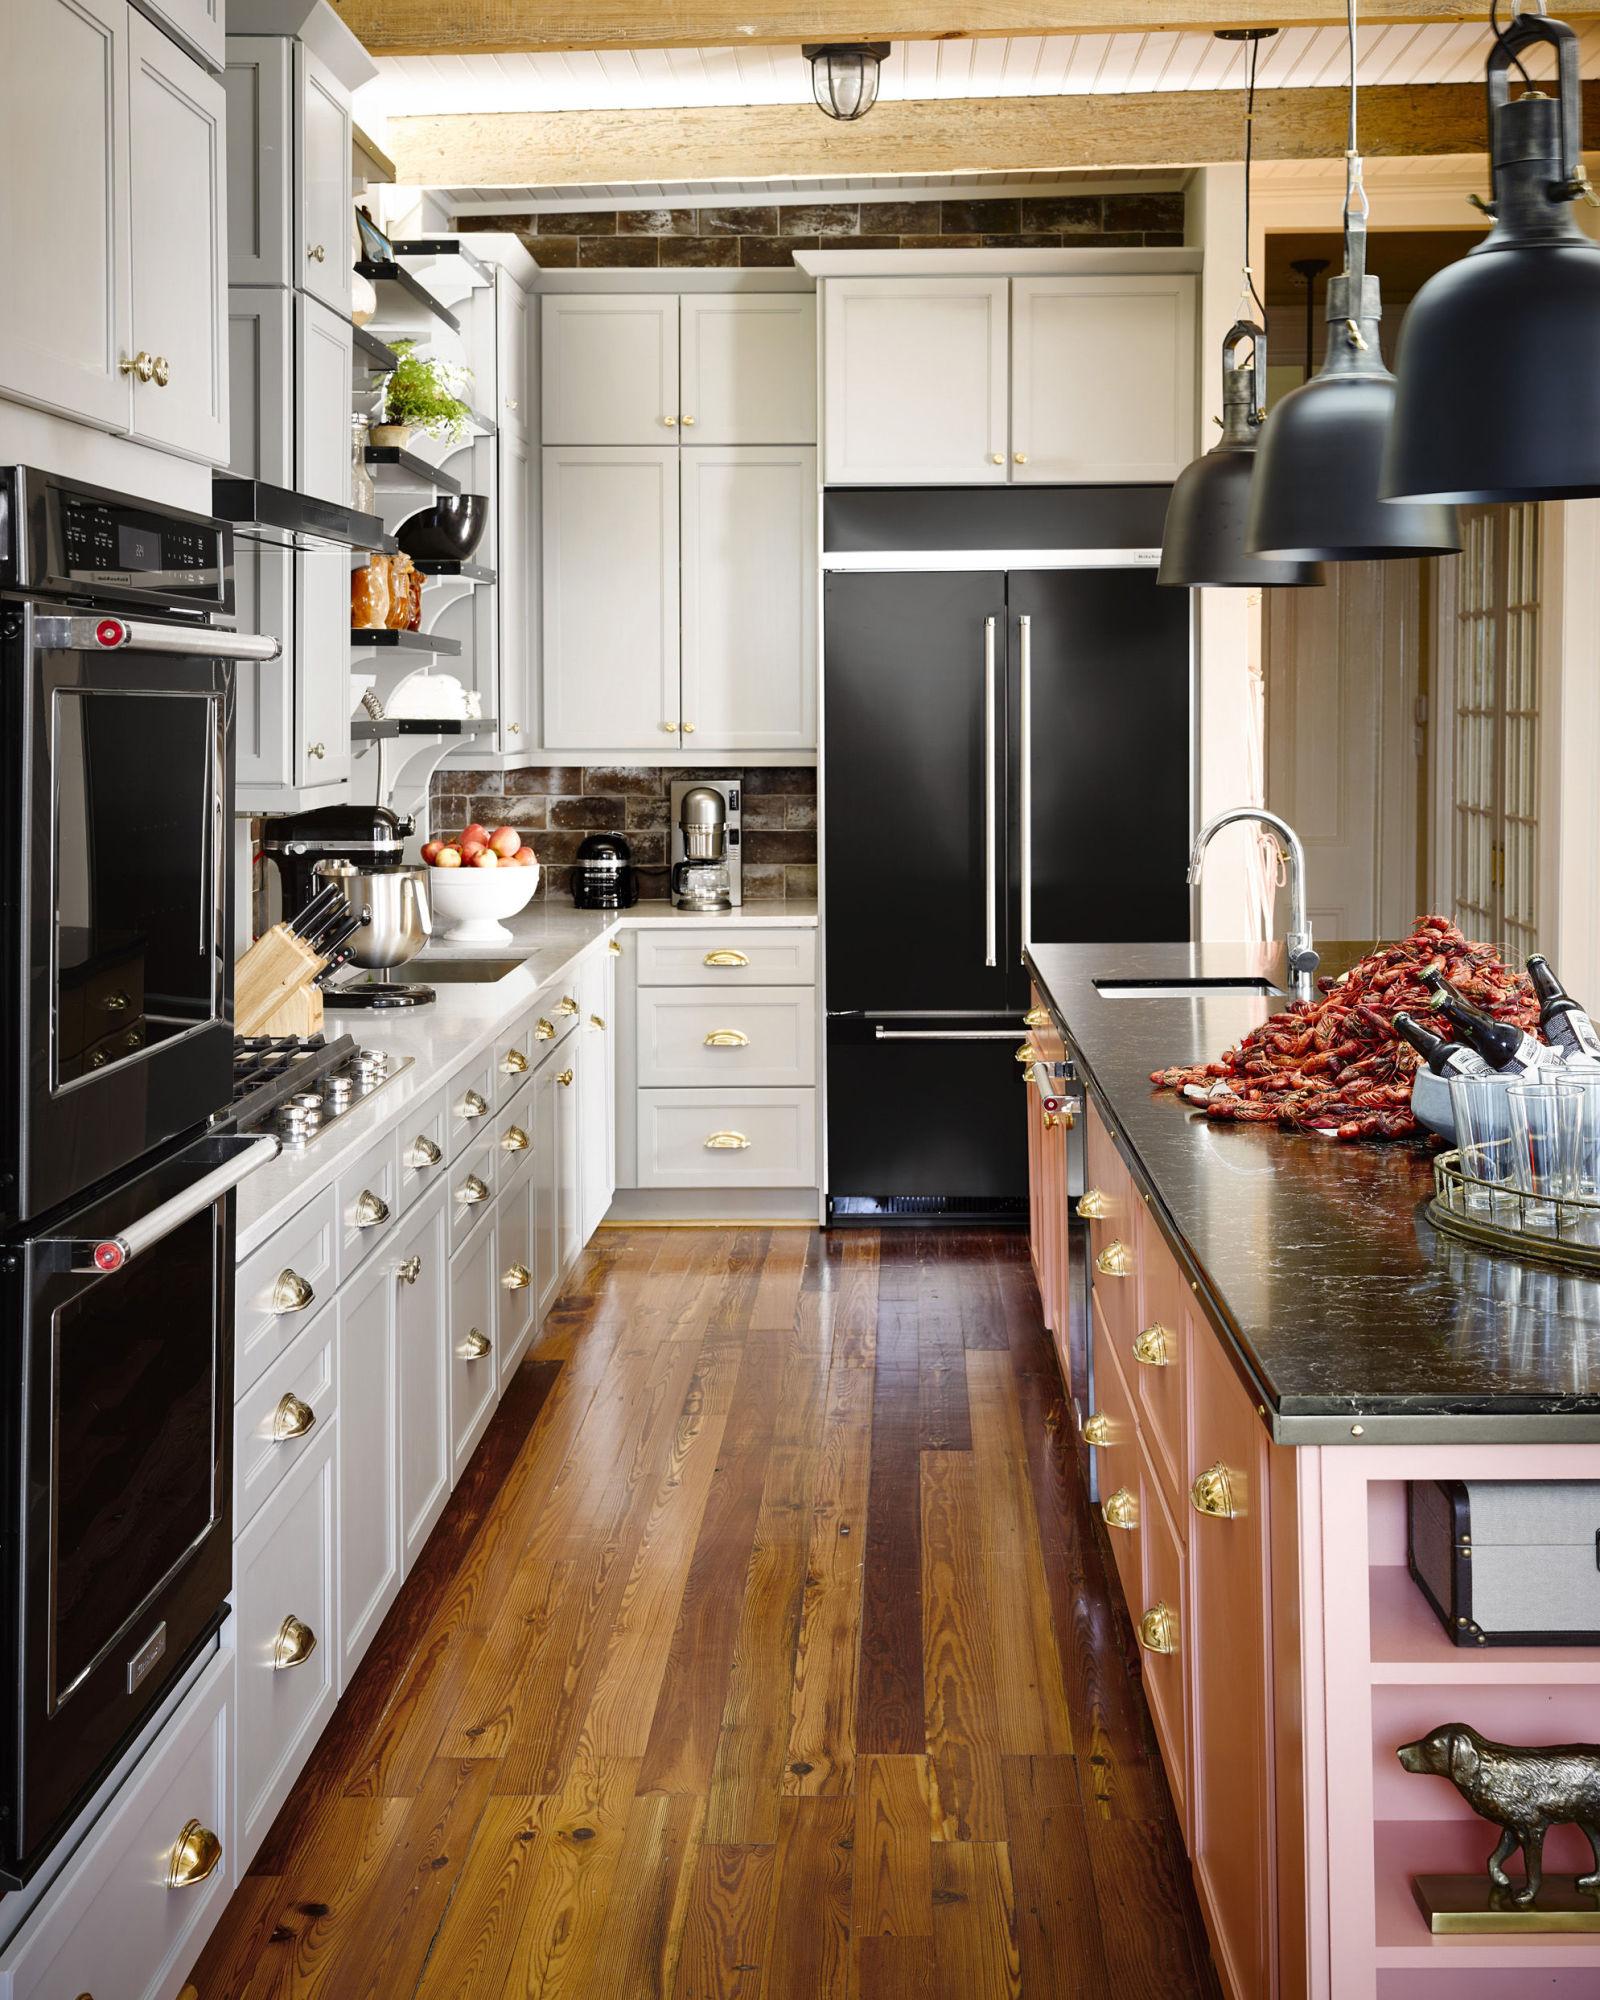 house beautiful kitchen of the year ken fulk kitchen design